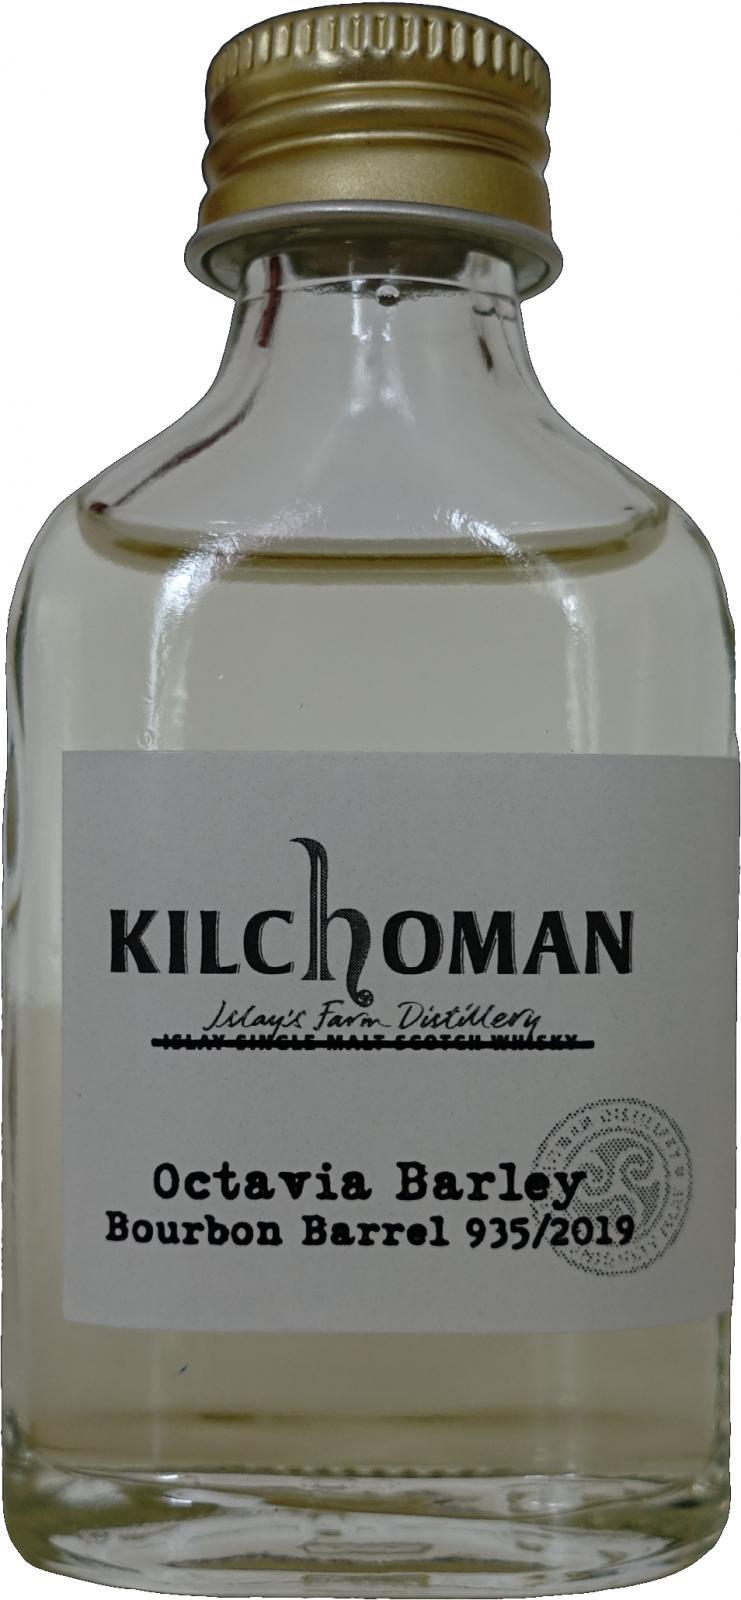 Kilchoman 2019 - Octavia Barley